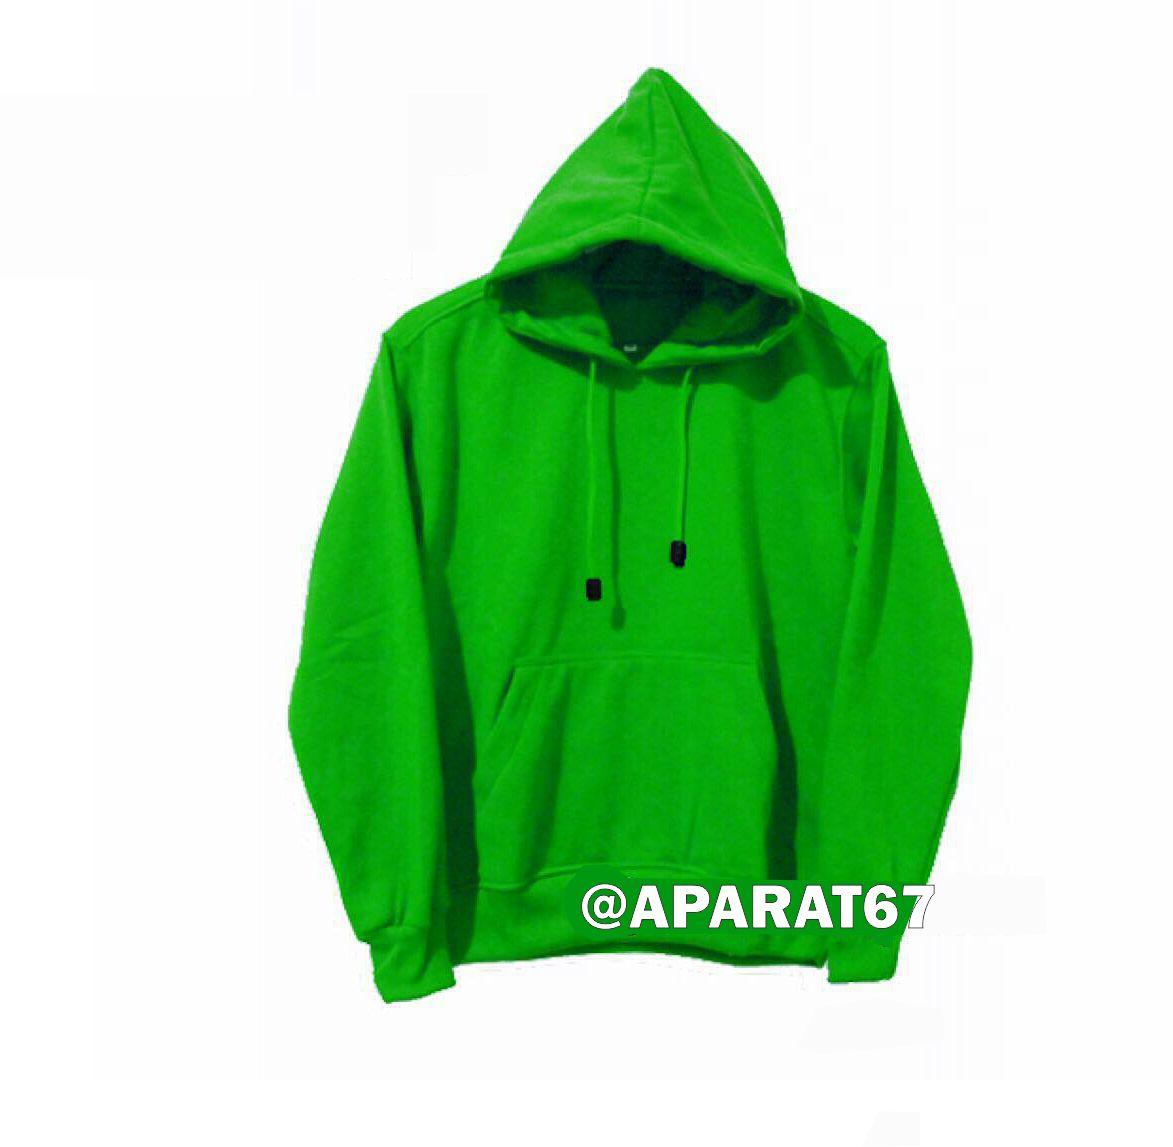 Jaket Polos Semarang Jual Hoodie Zipper Keren Biru 085784417633